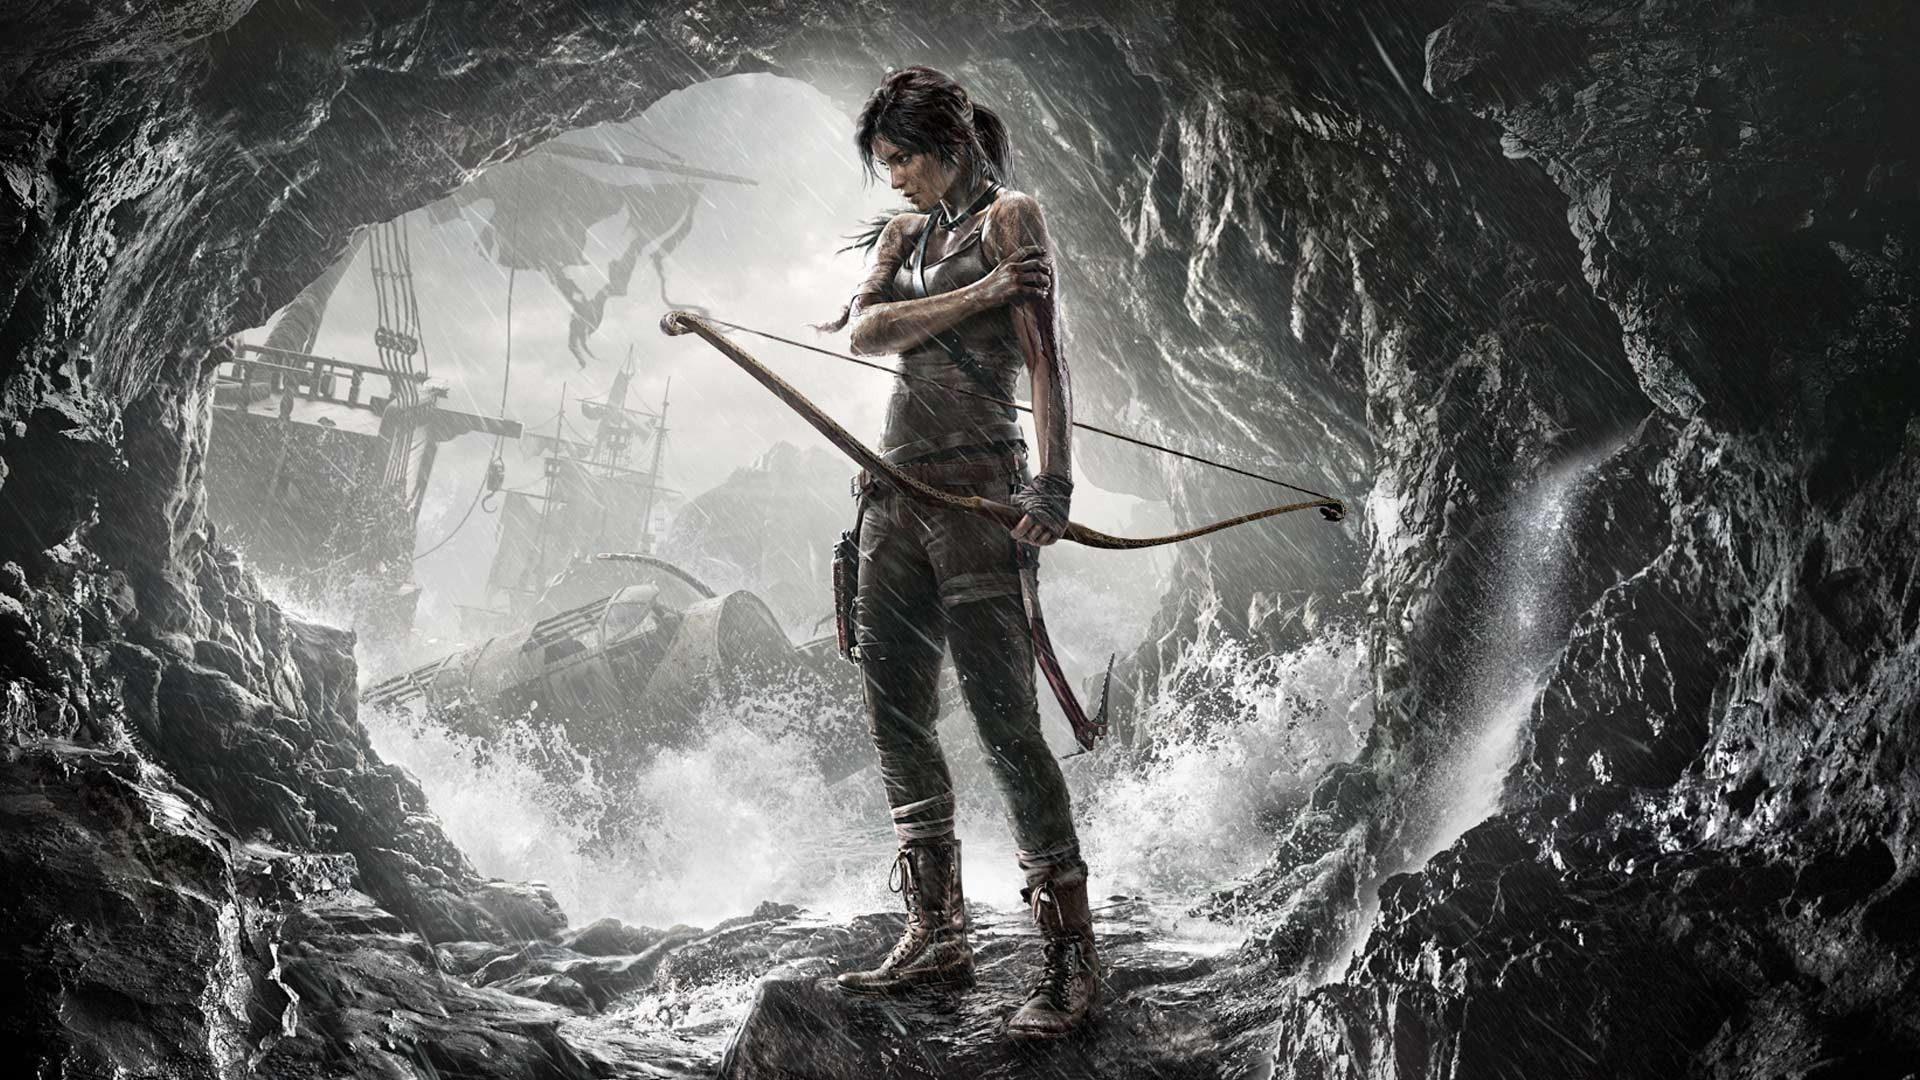 Lara Croft Tomb Raider Arrows Artwork Black Hair Wallpaper Tomb